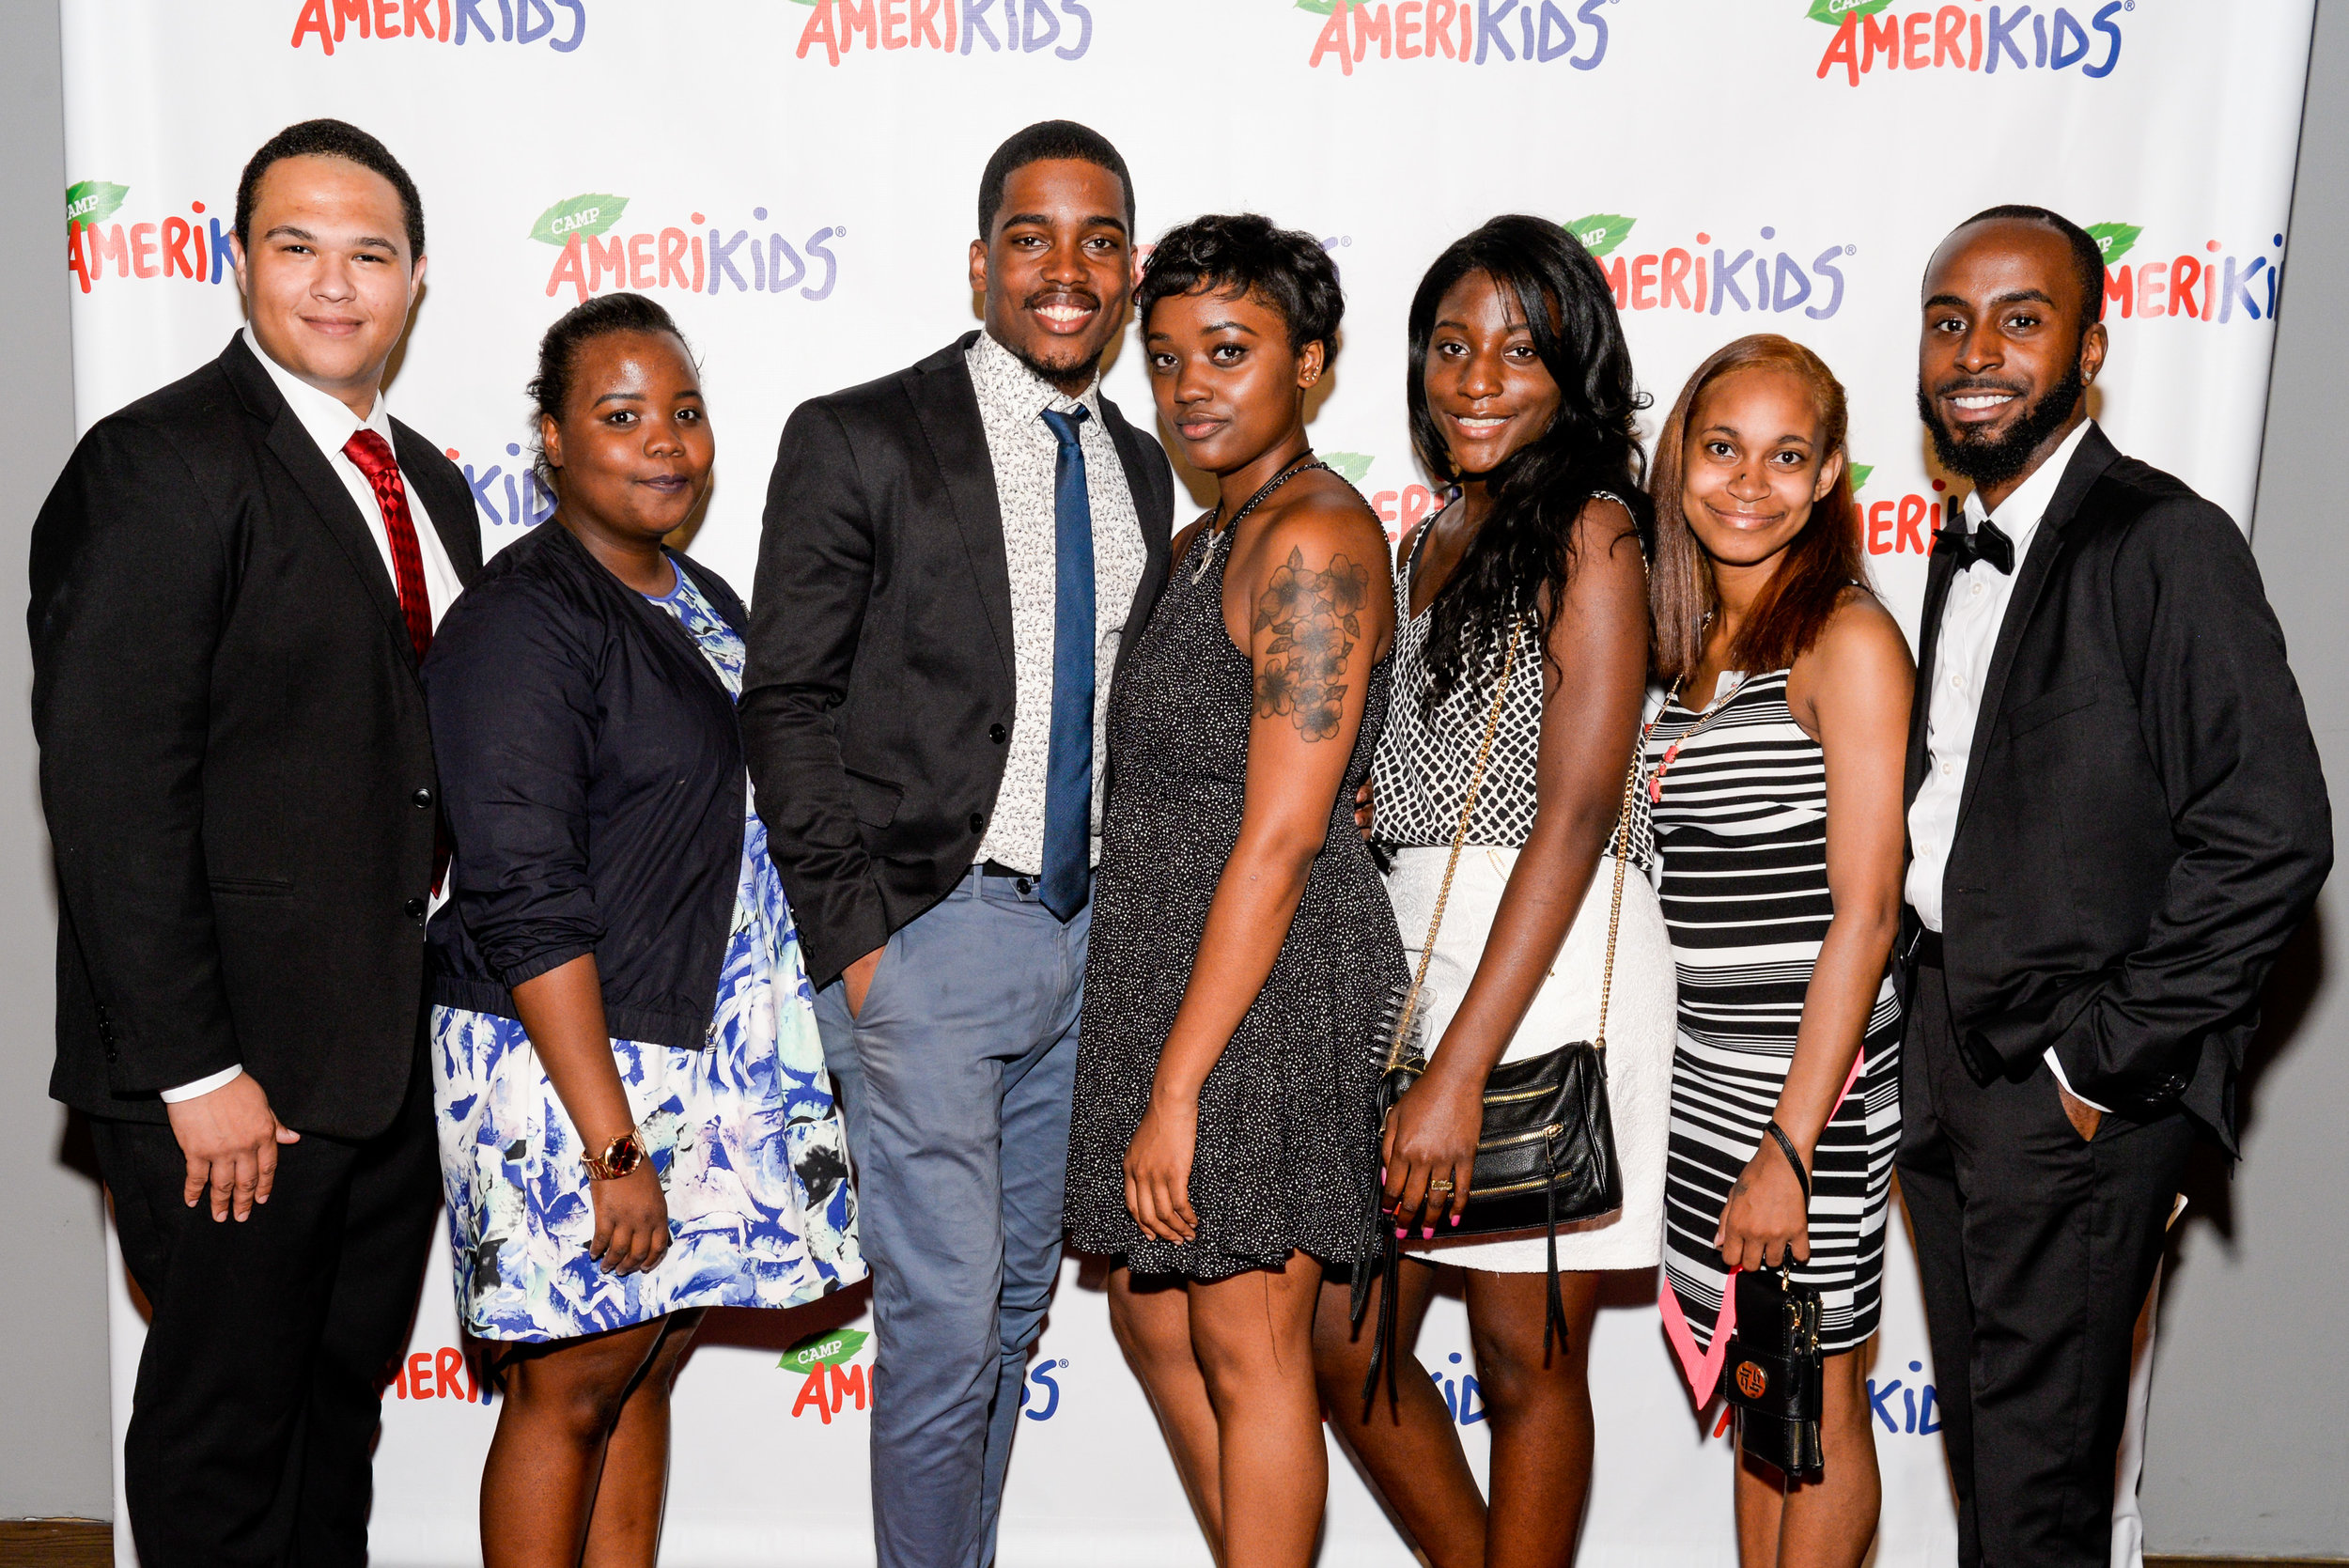 2015 Camp AmeriKids 25th Anniversary Benefit 003.JPG